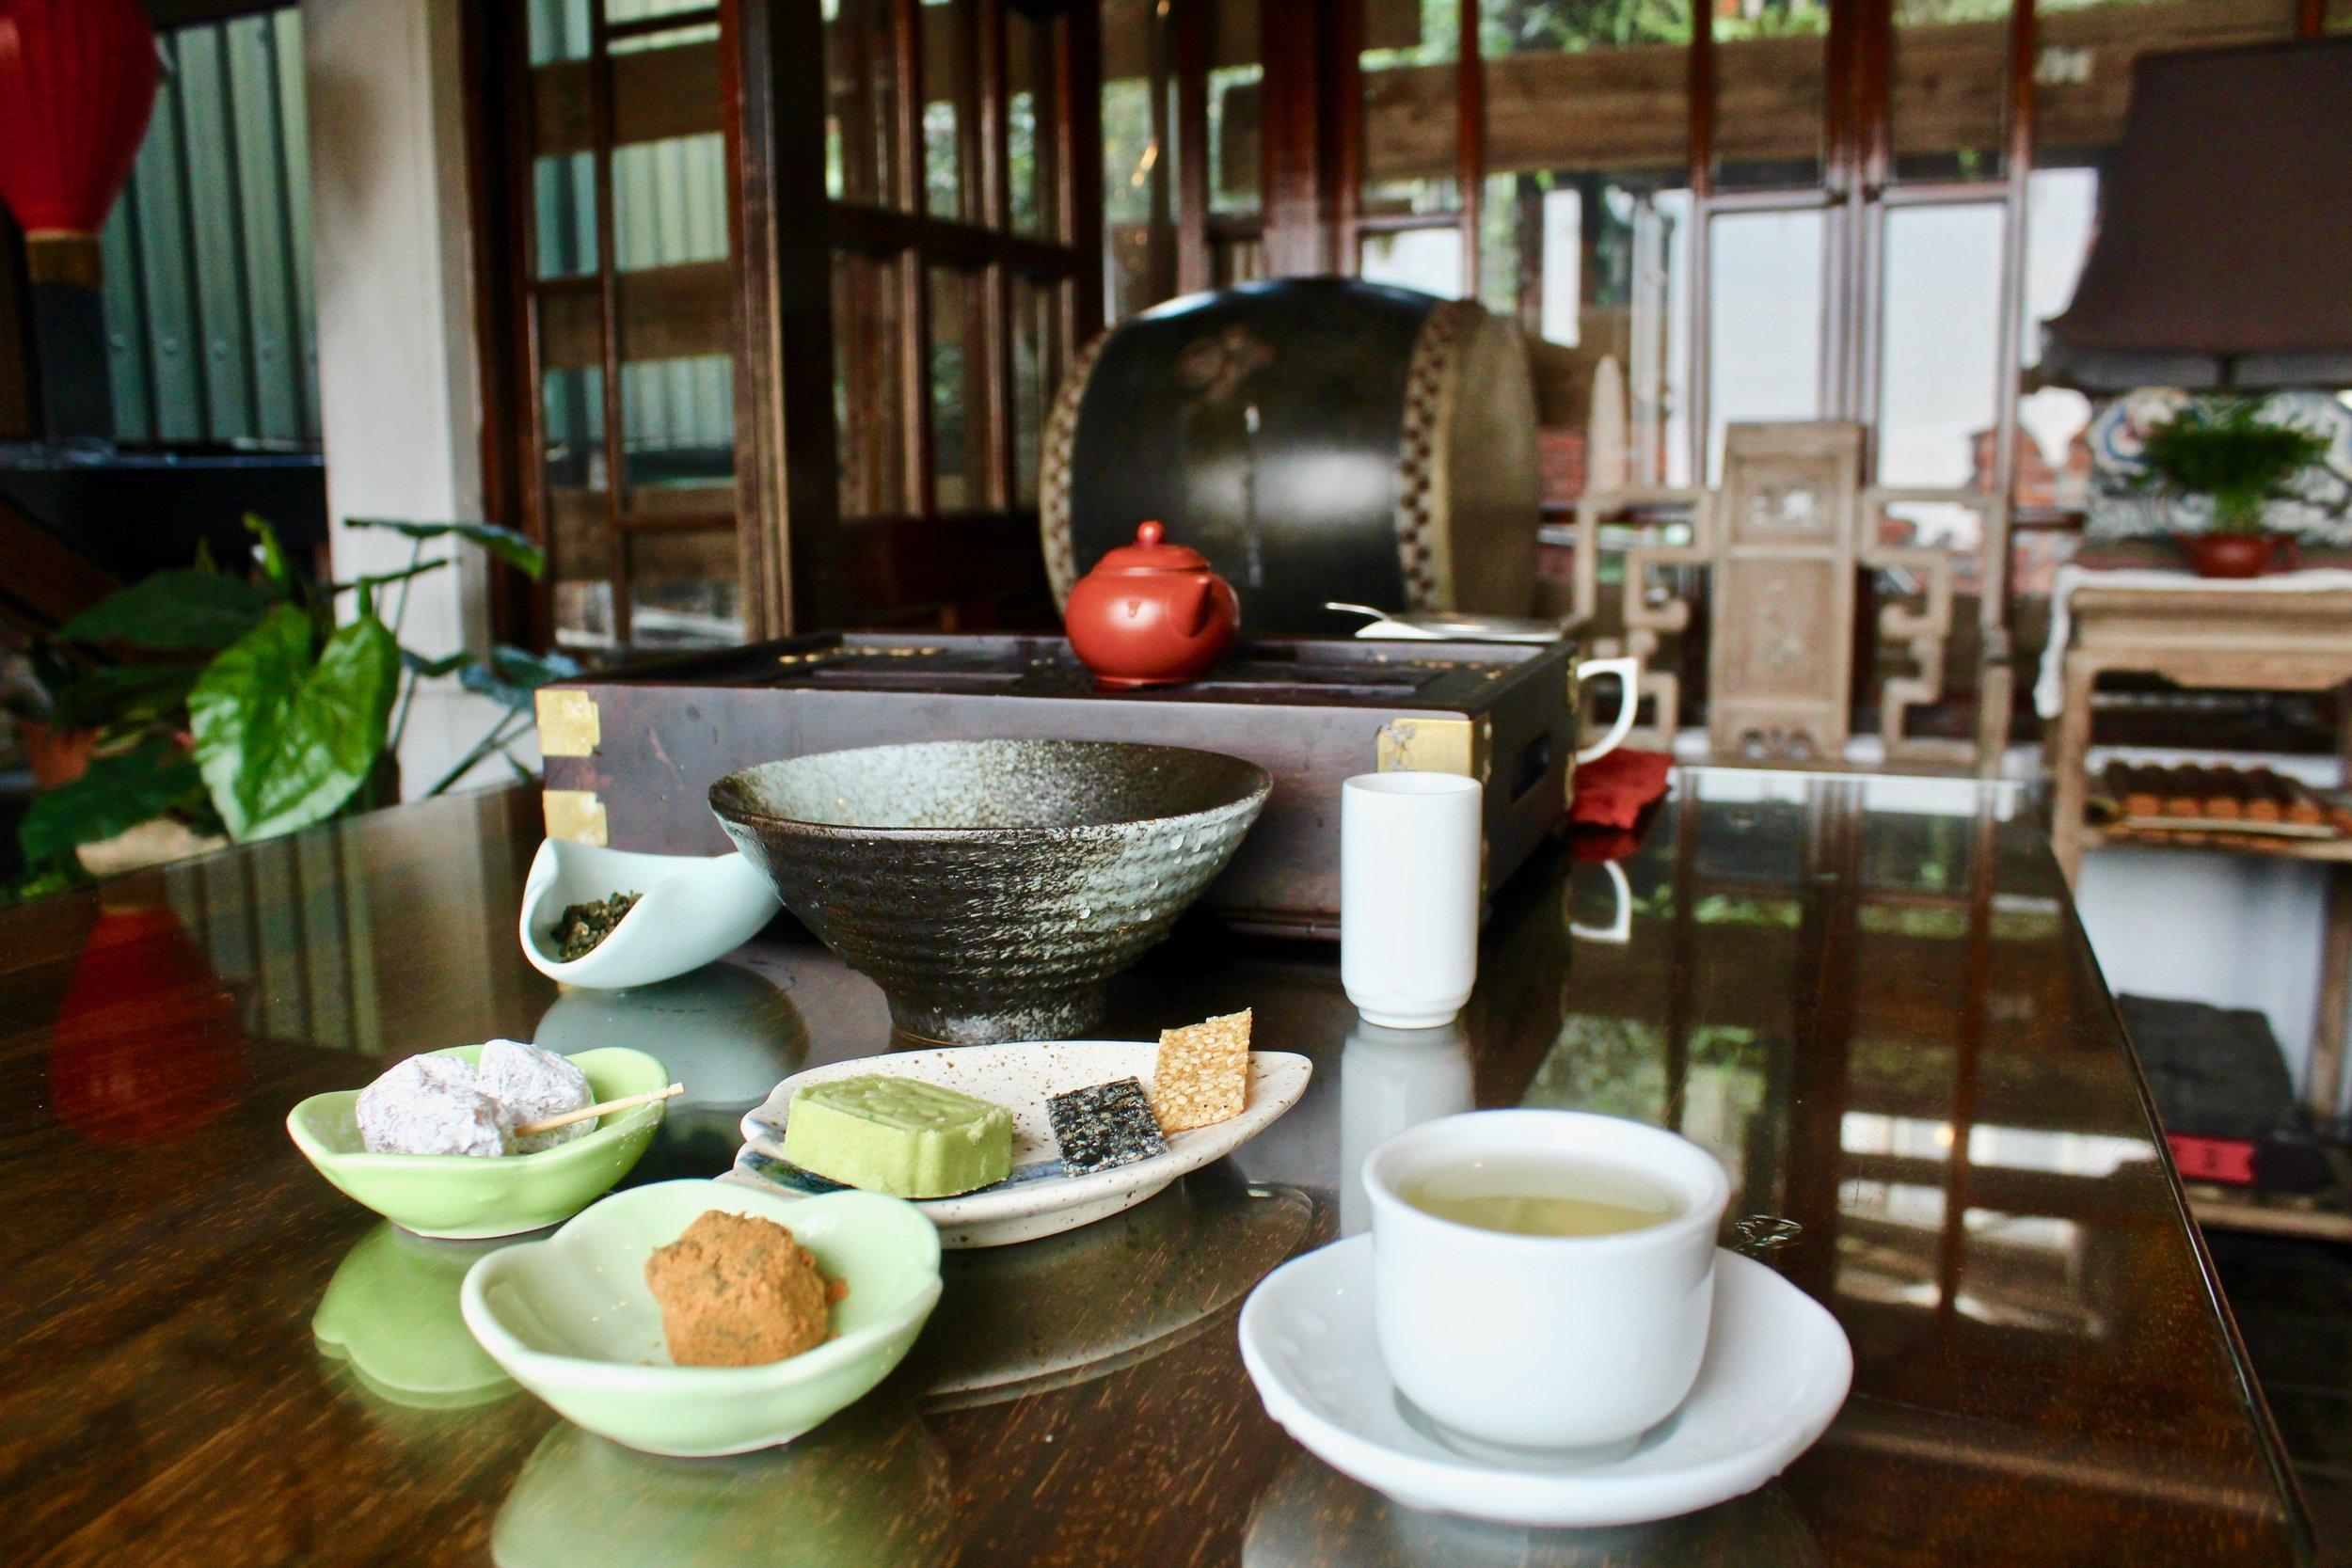 The tea set you can enjoy in said tea house.